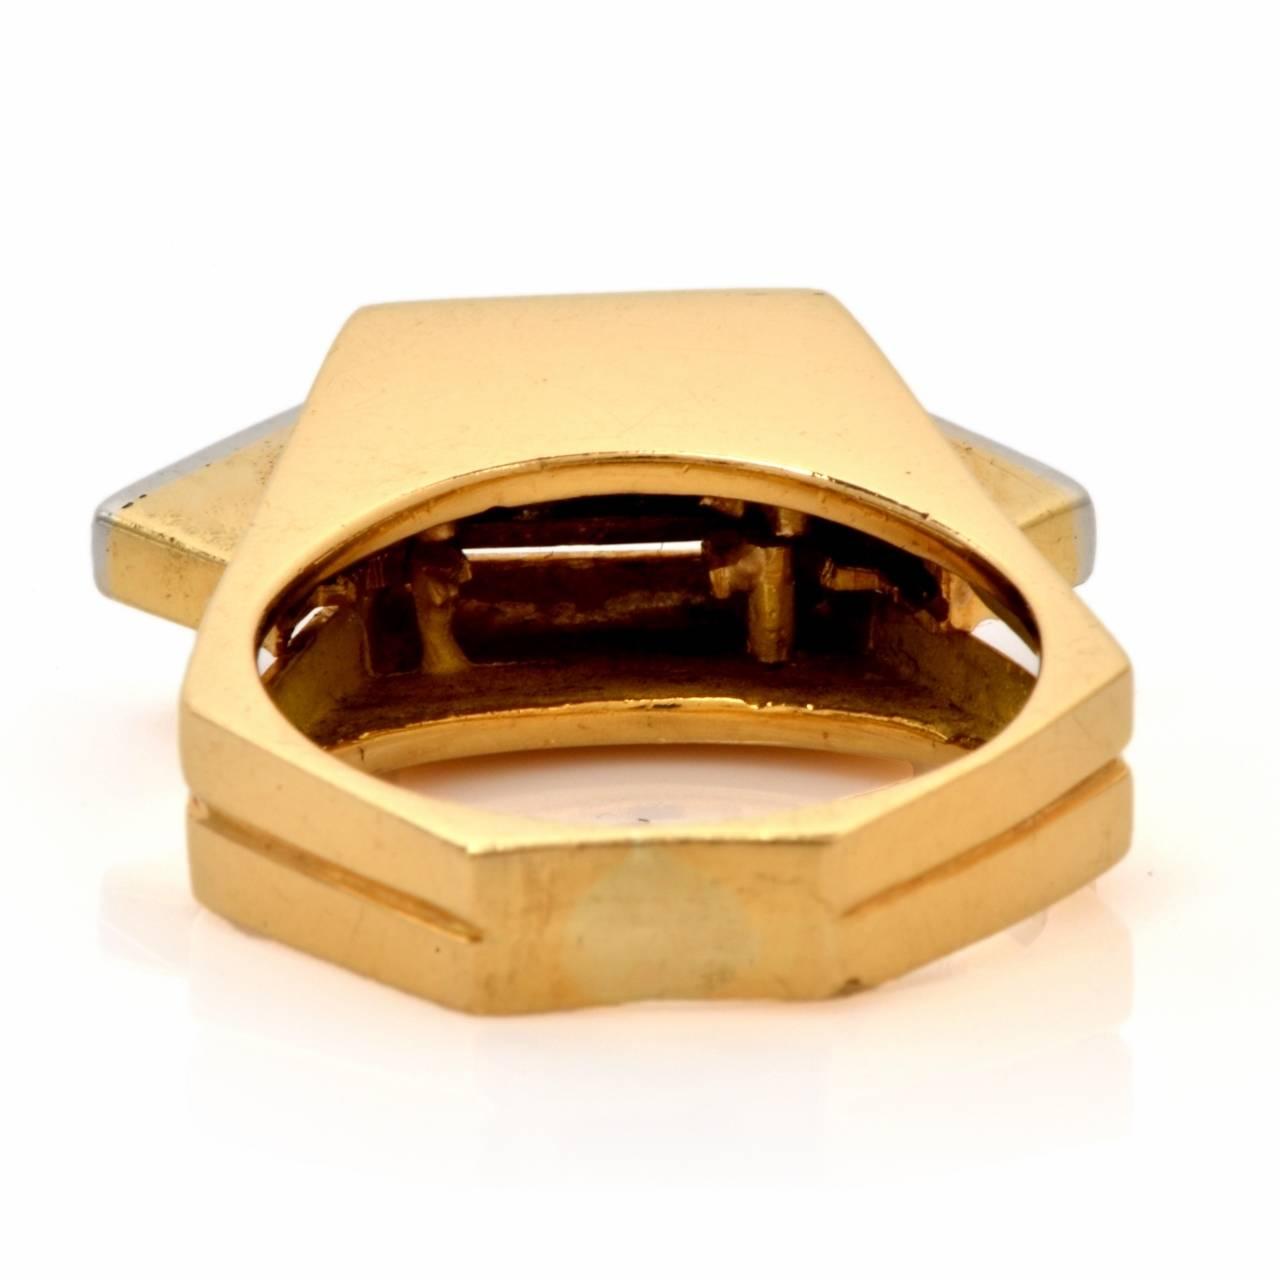 Retro Diamond Gold Geometric Pyramidal Design Ring 4